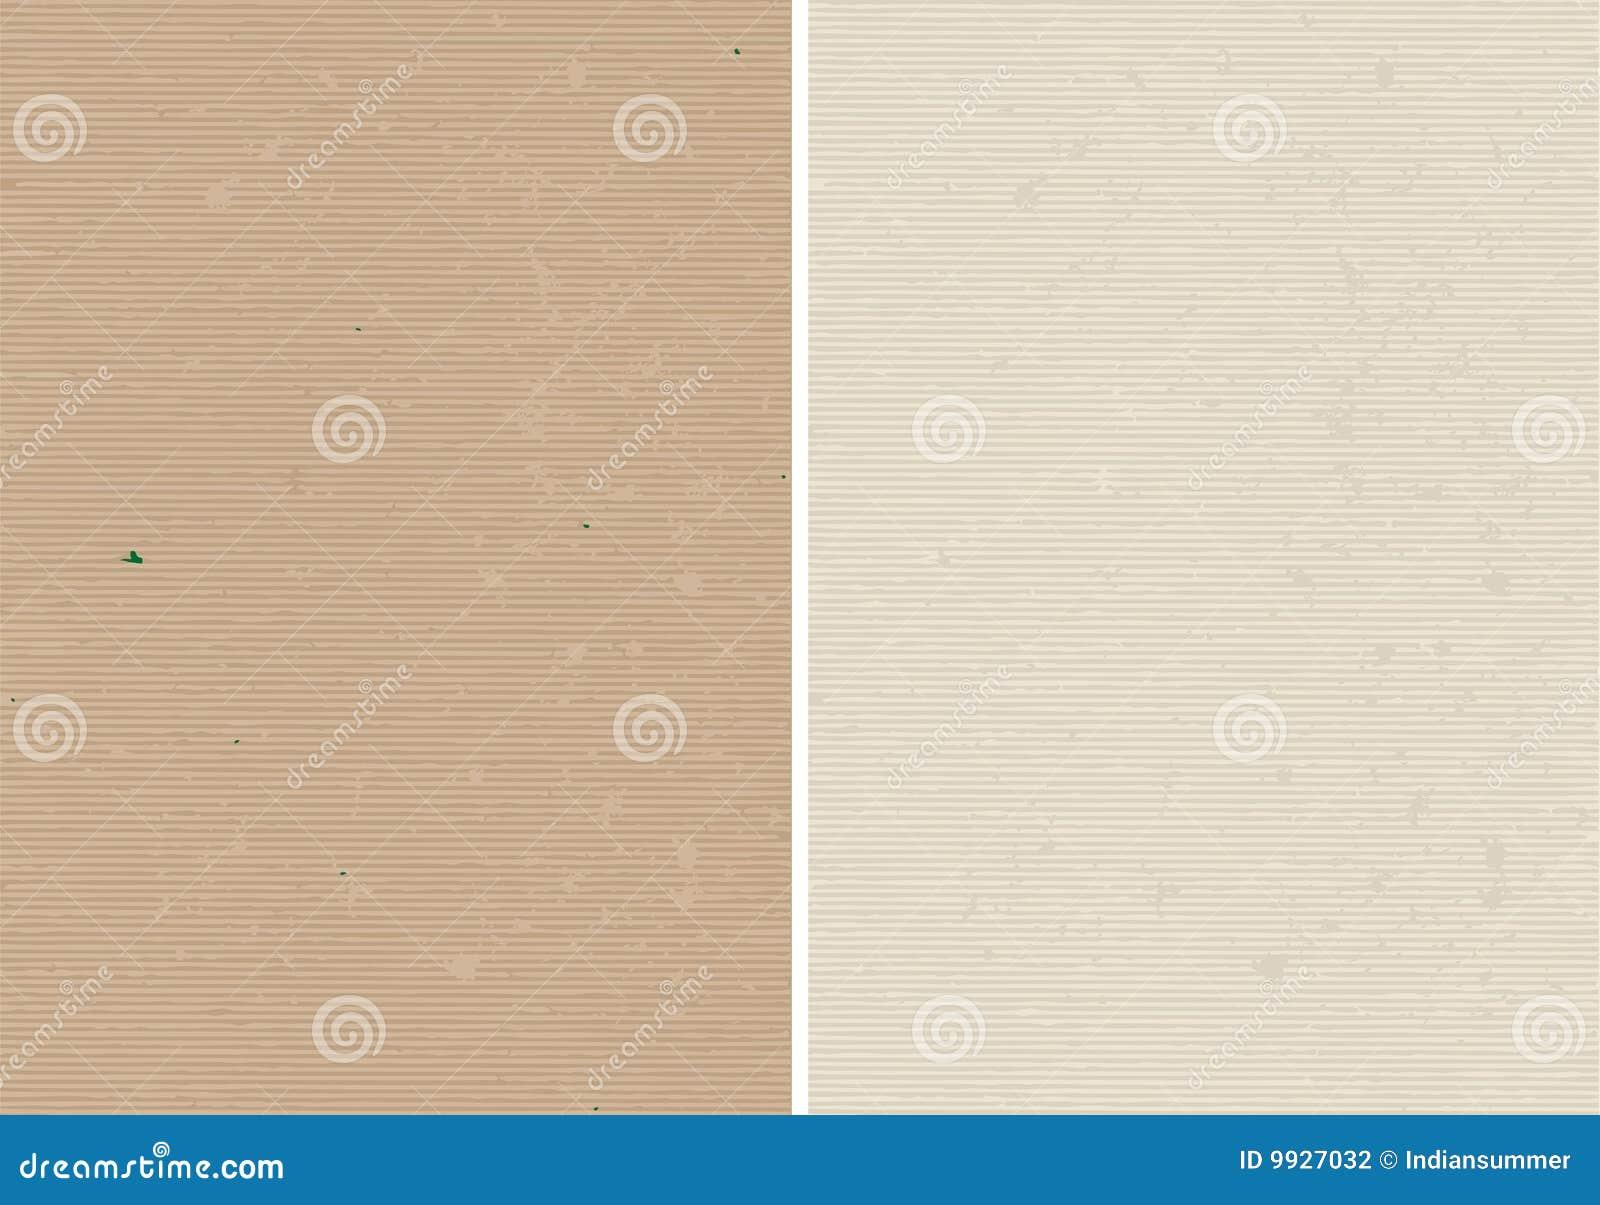 Texture rayée et ridée approximative